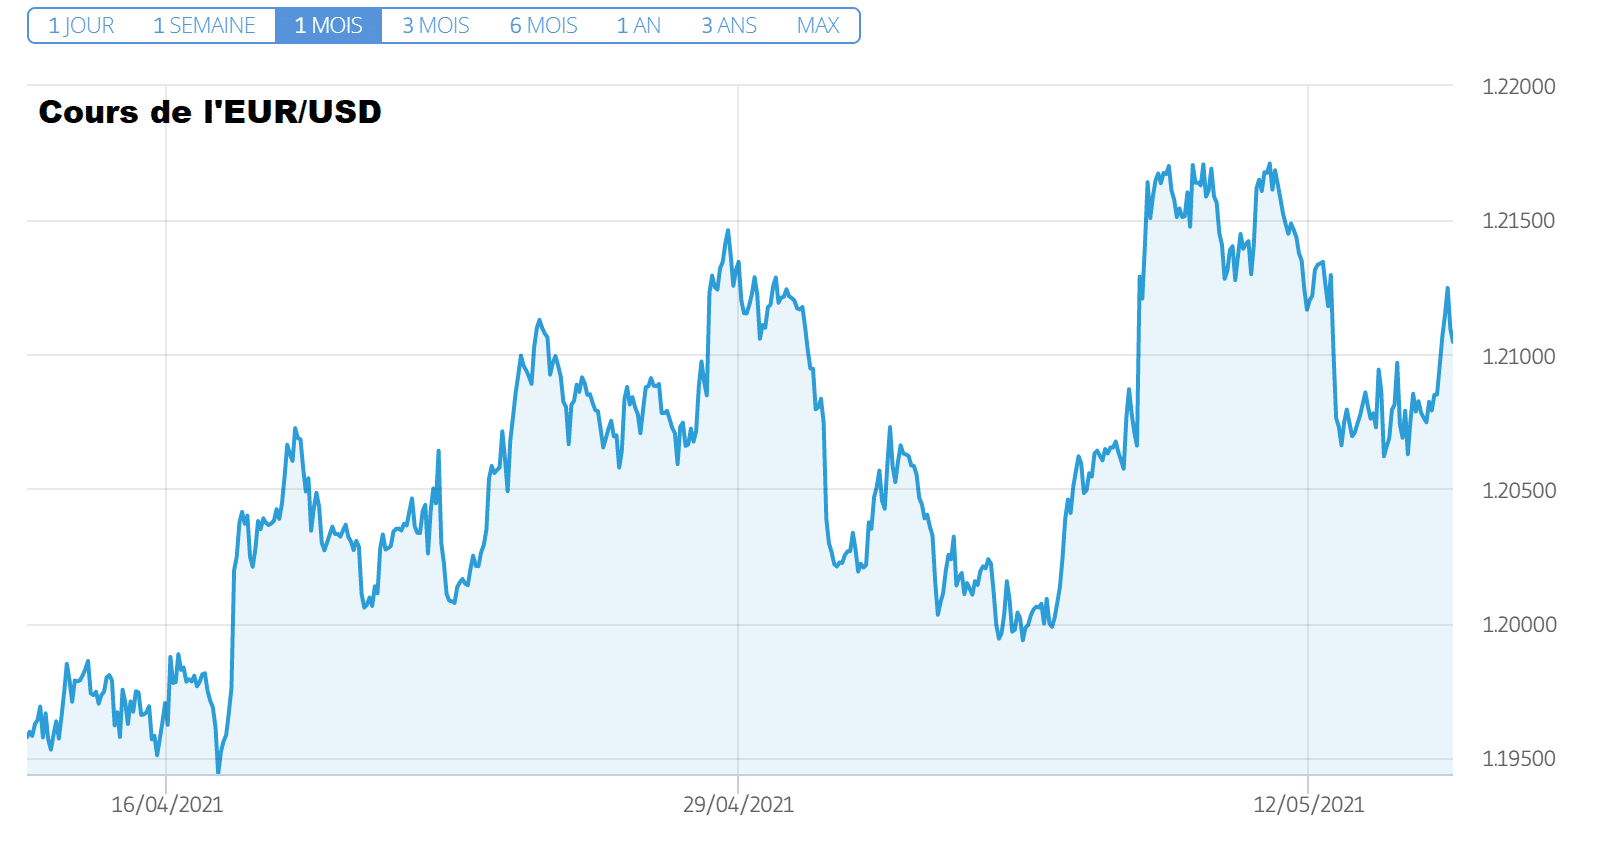 cours EUR USD vendredi 14 mai 2021